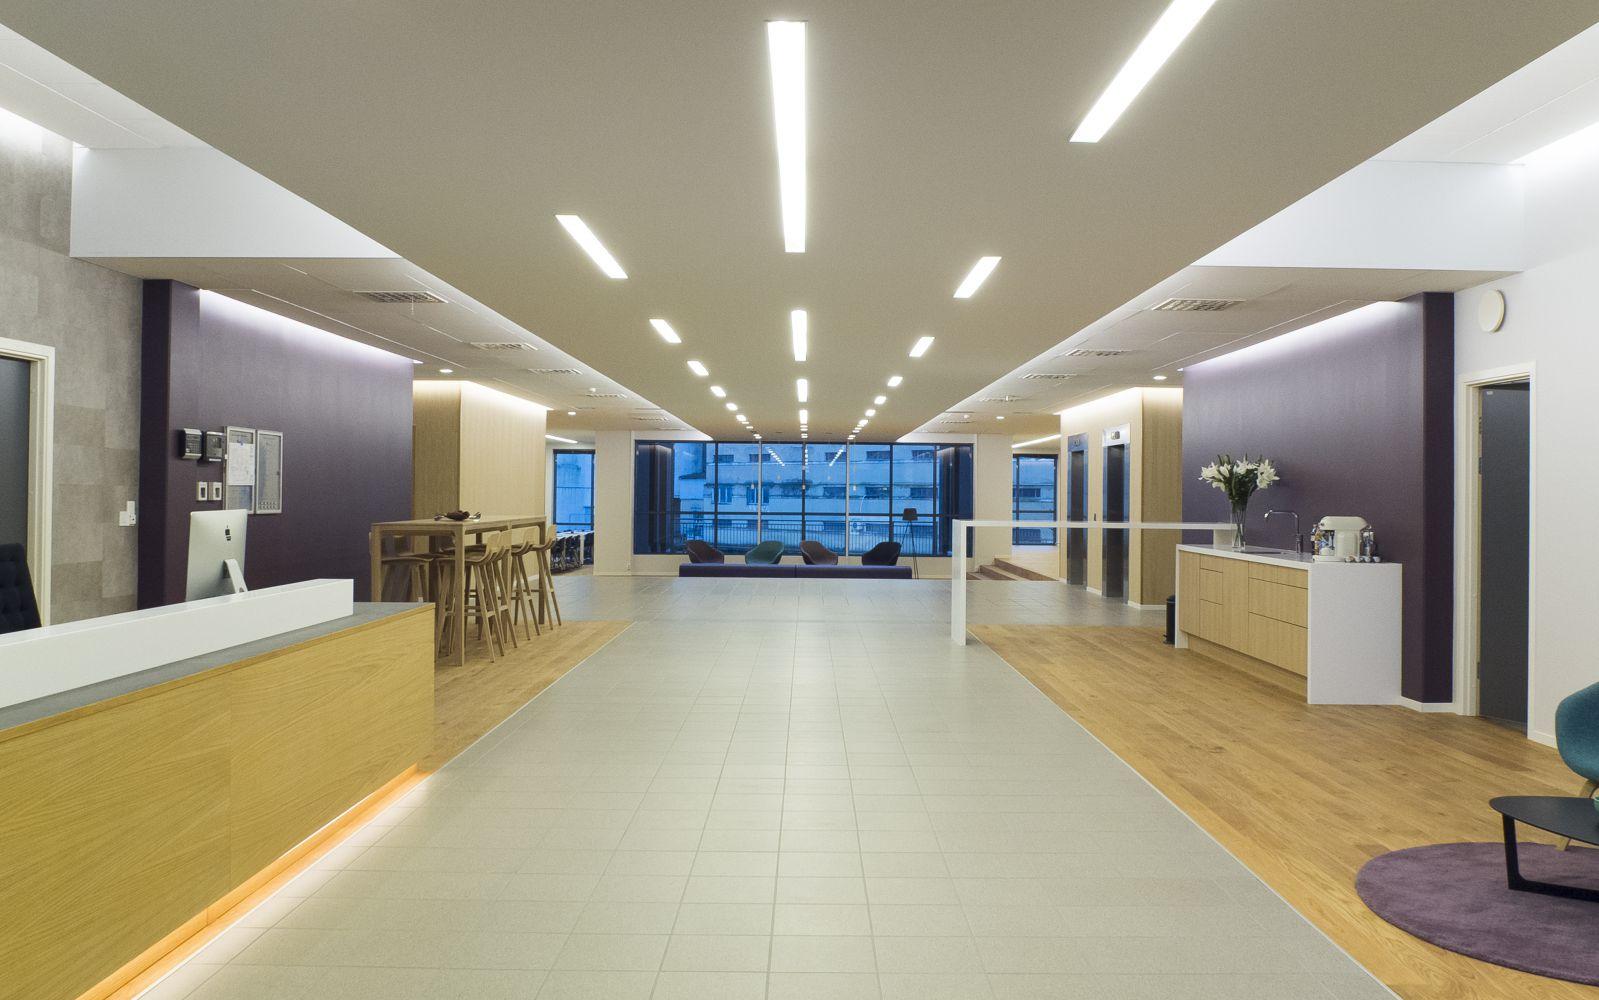 Nyheter - Stockholm Lighting Company AB